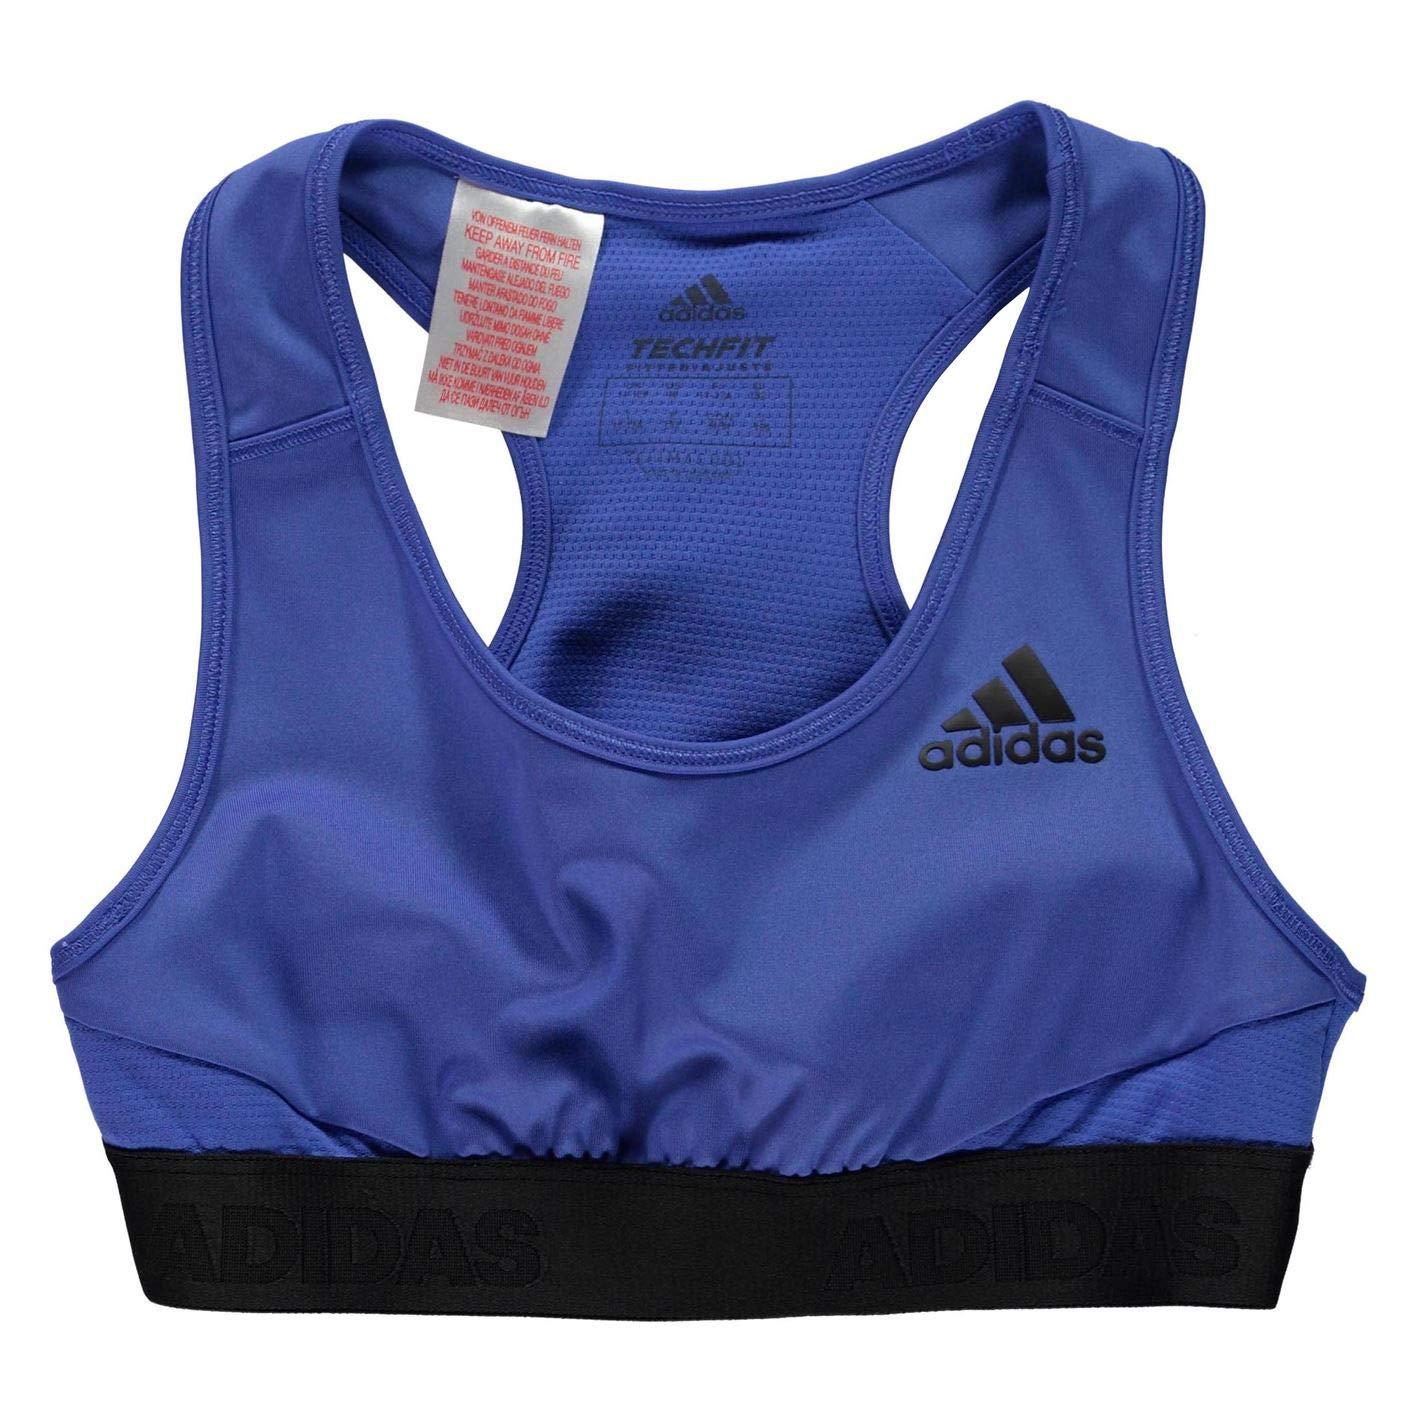 adidas Essentials Girls 'Alpha Sport with Light Skin Support, Girls